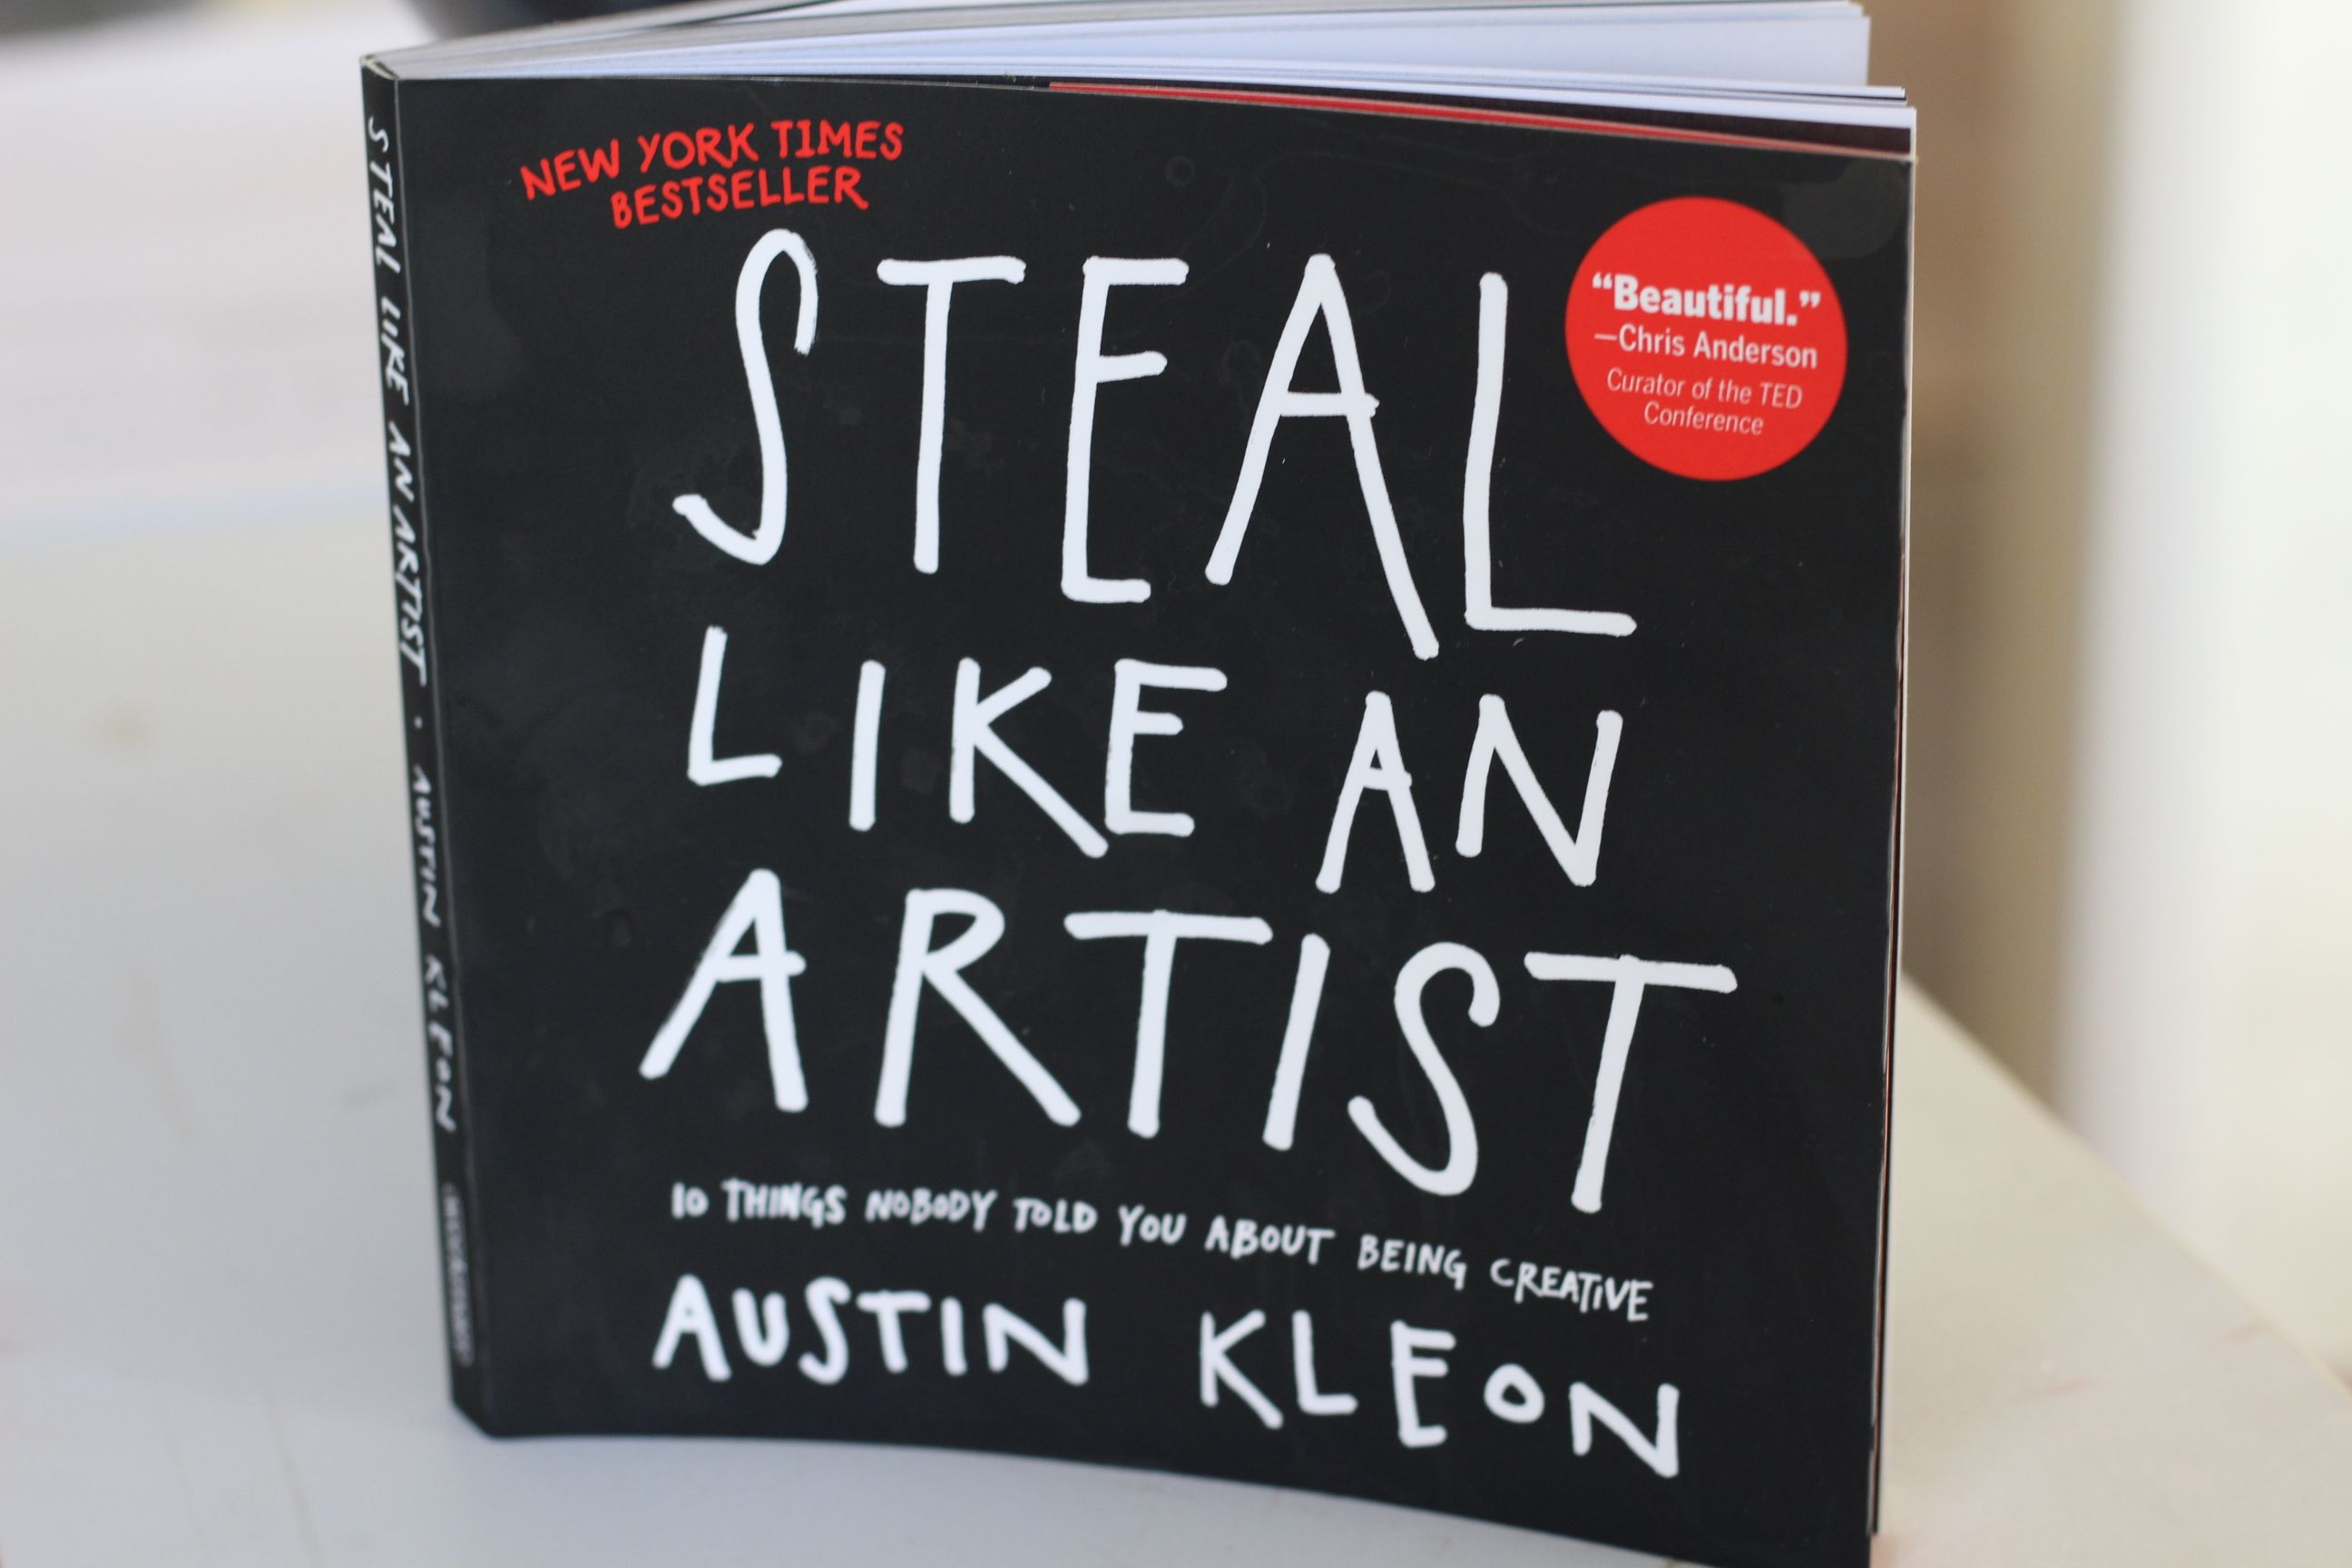 Steal like an artist by austin kleon austin kleon